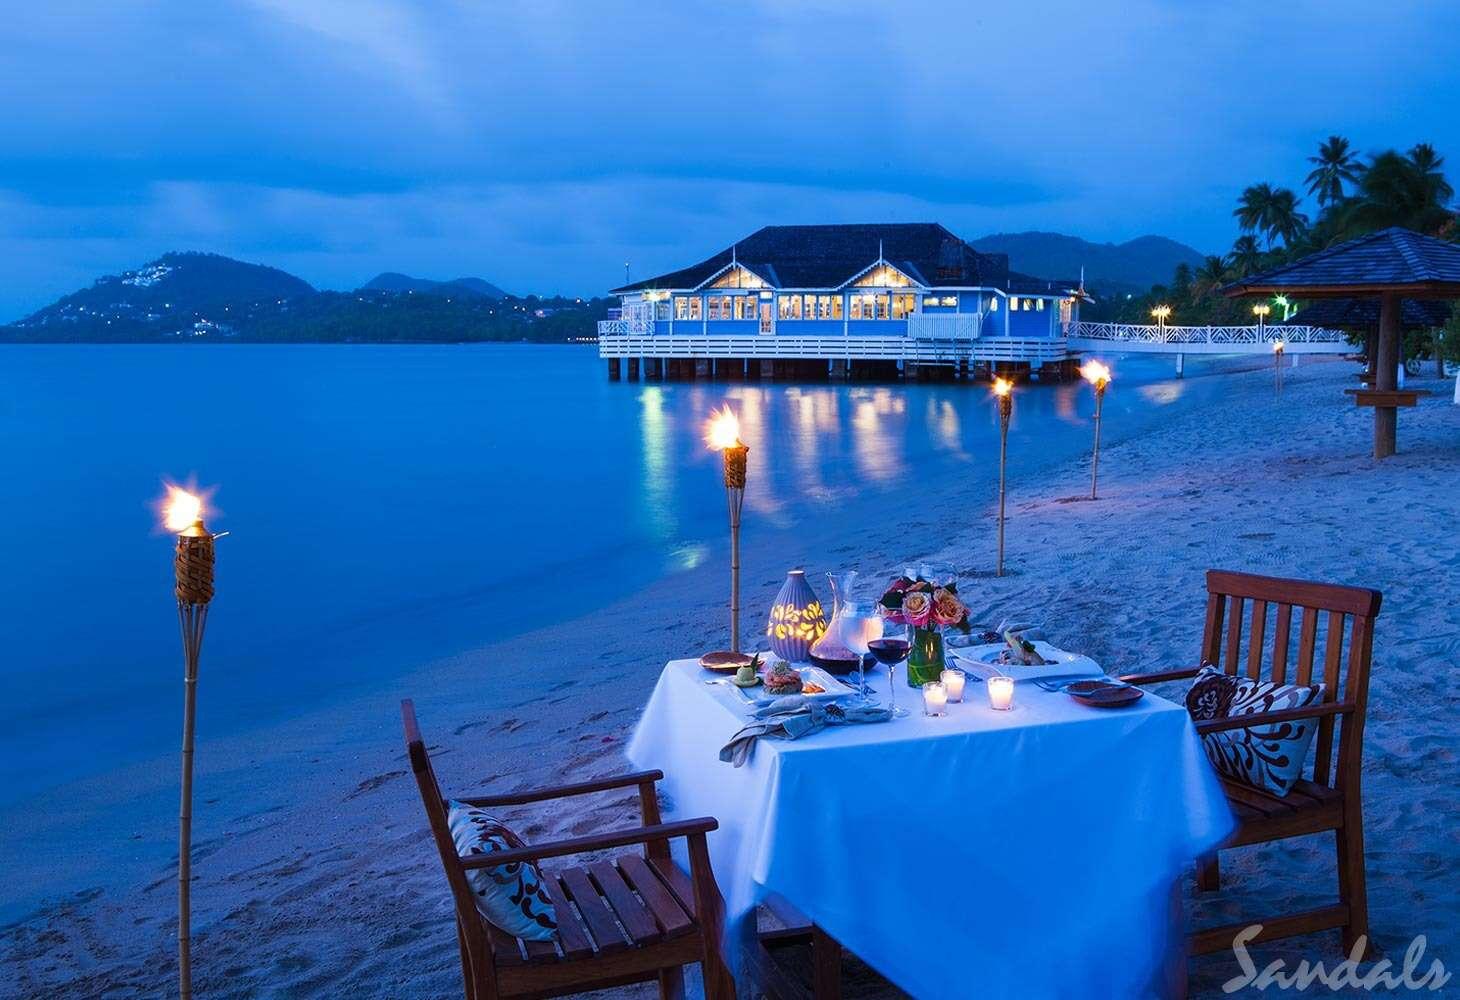 Sandals Halcyon Beach St. Lucia